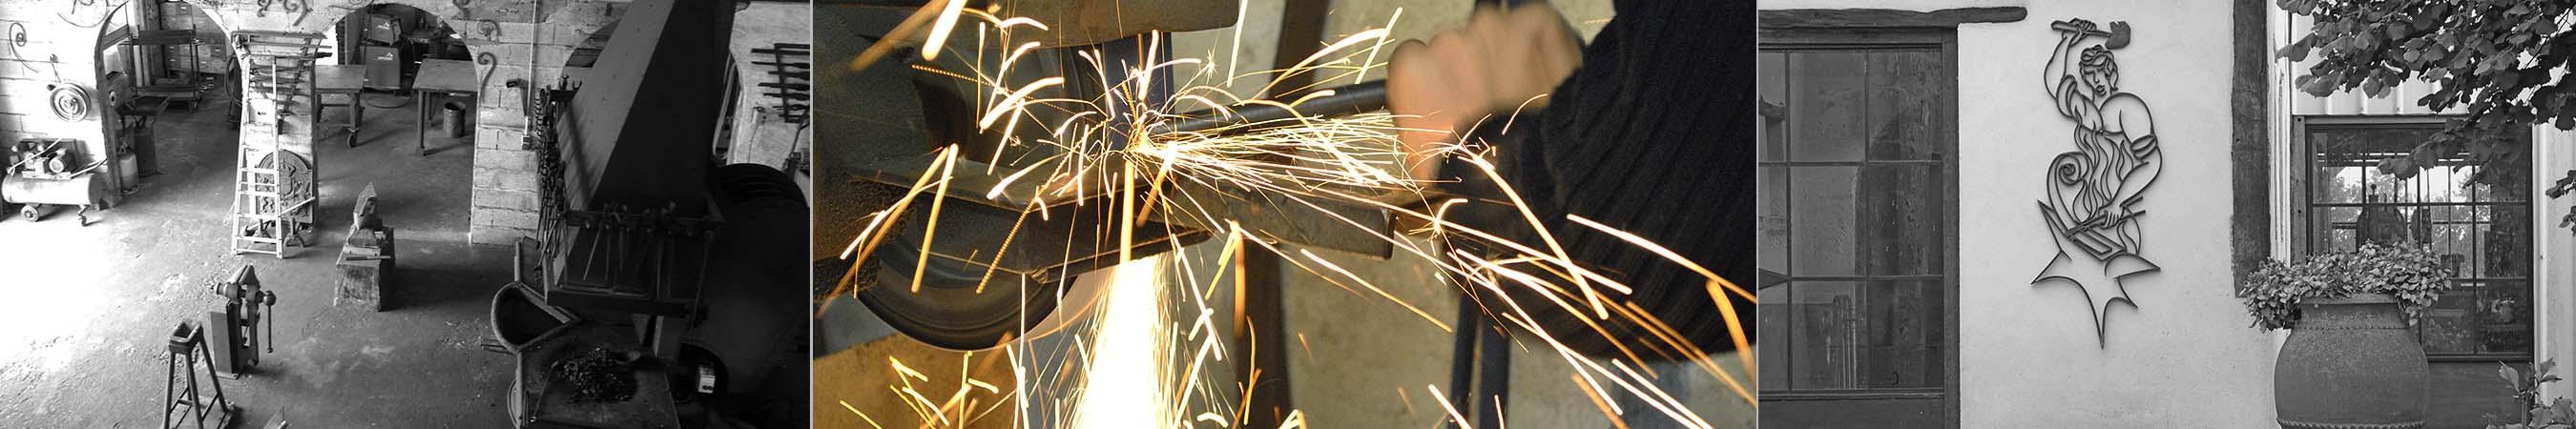 showromm-forge-ferronnerie-boquet-2